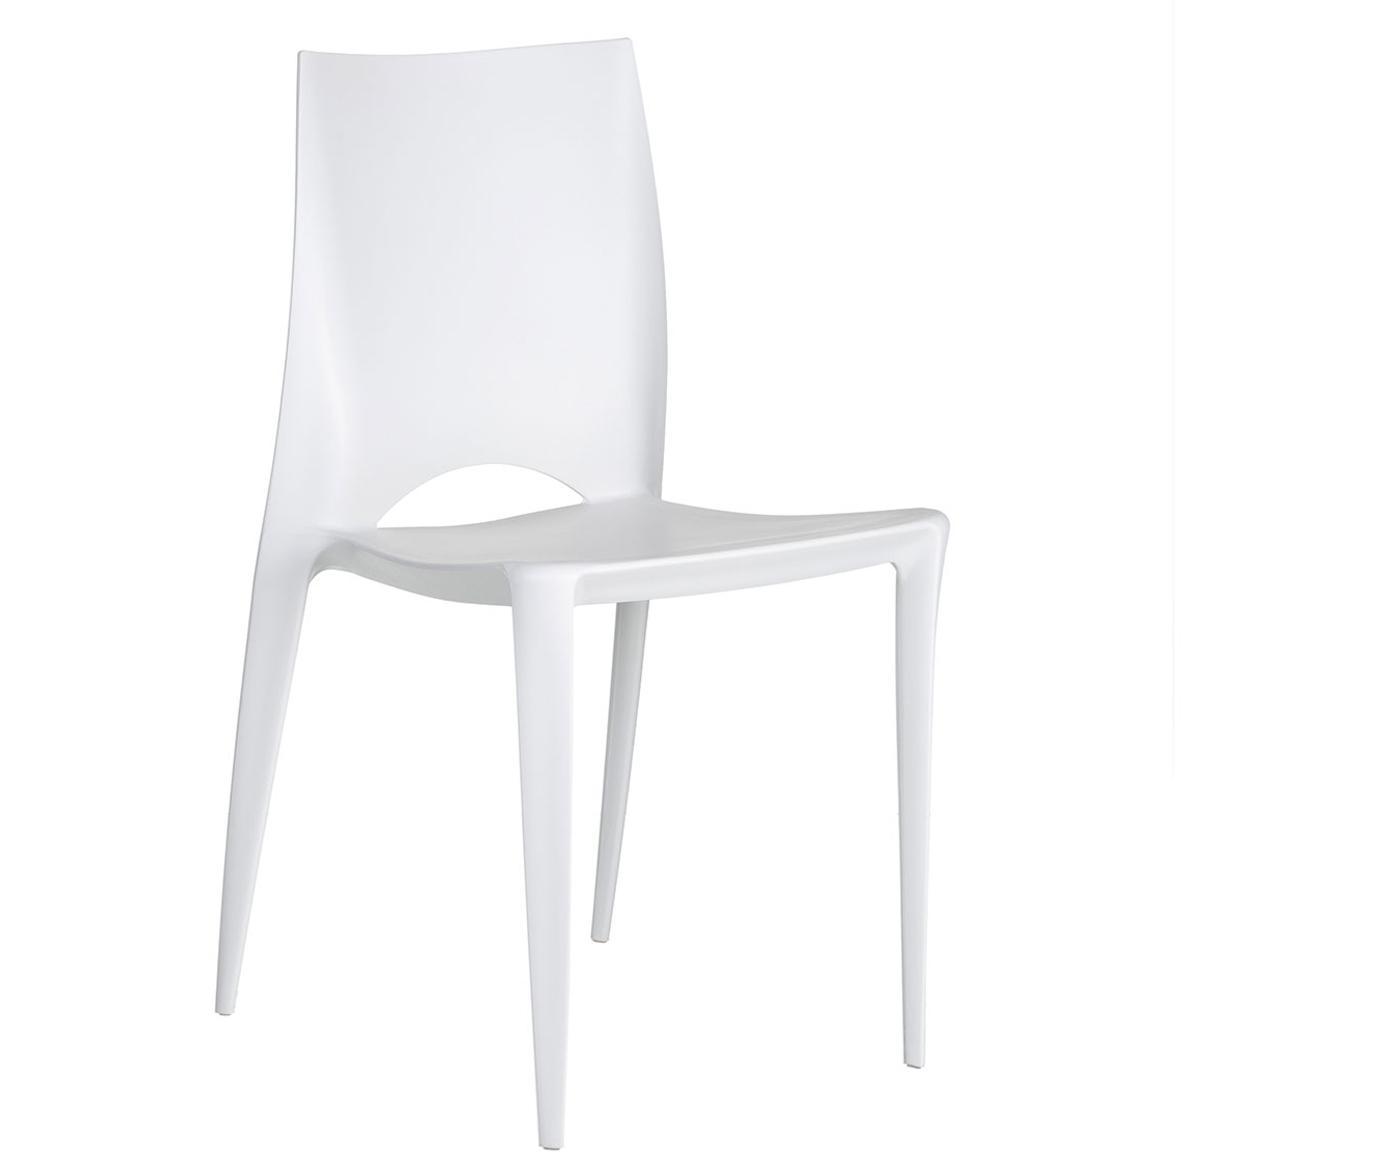 Silla Binster, Polipropileno, Blanco, An 44 x Al 84 cm